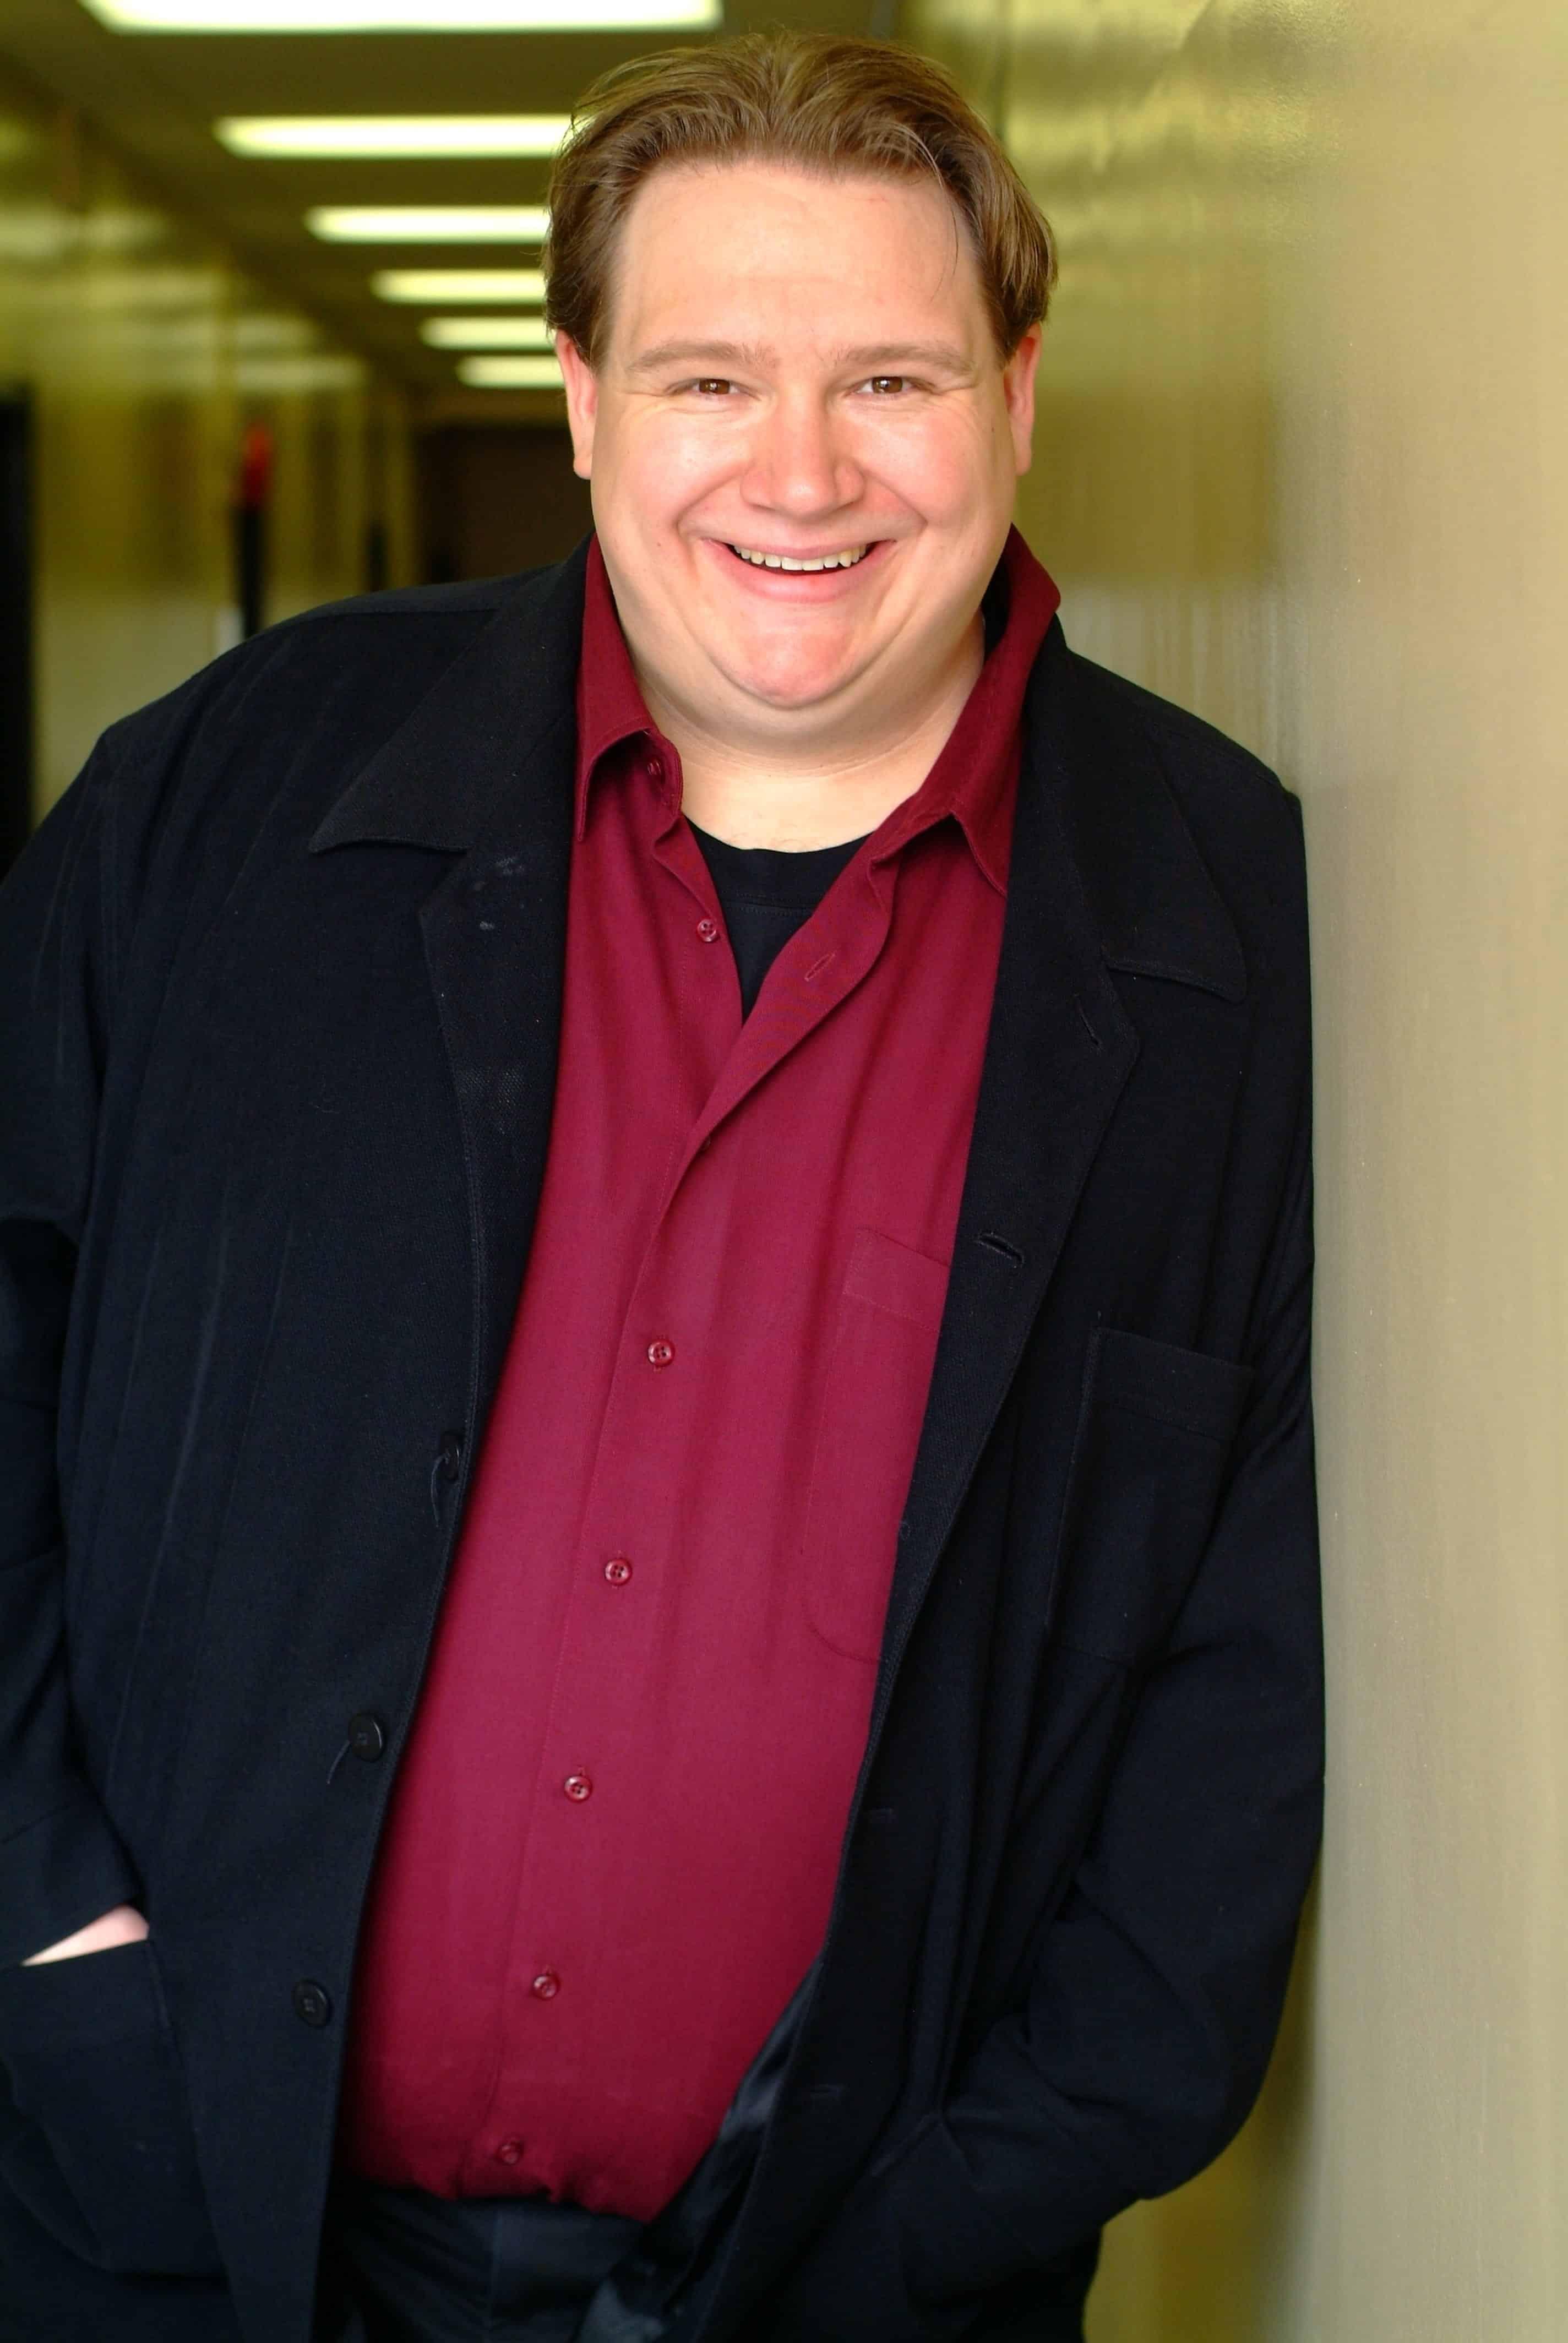 Sheldon Bergstrom